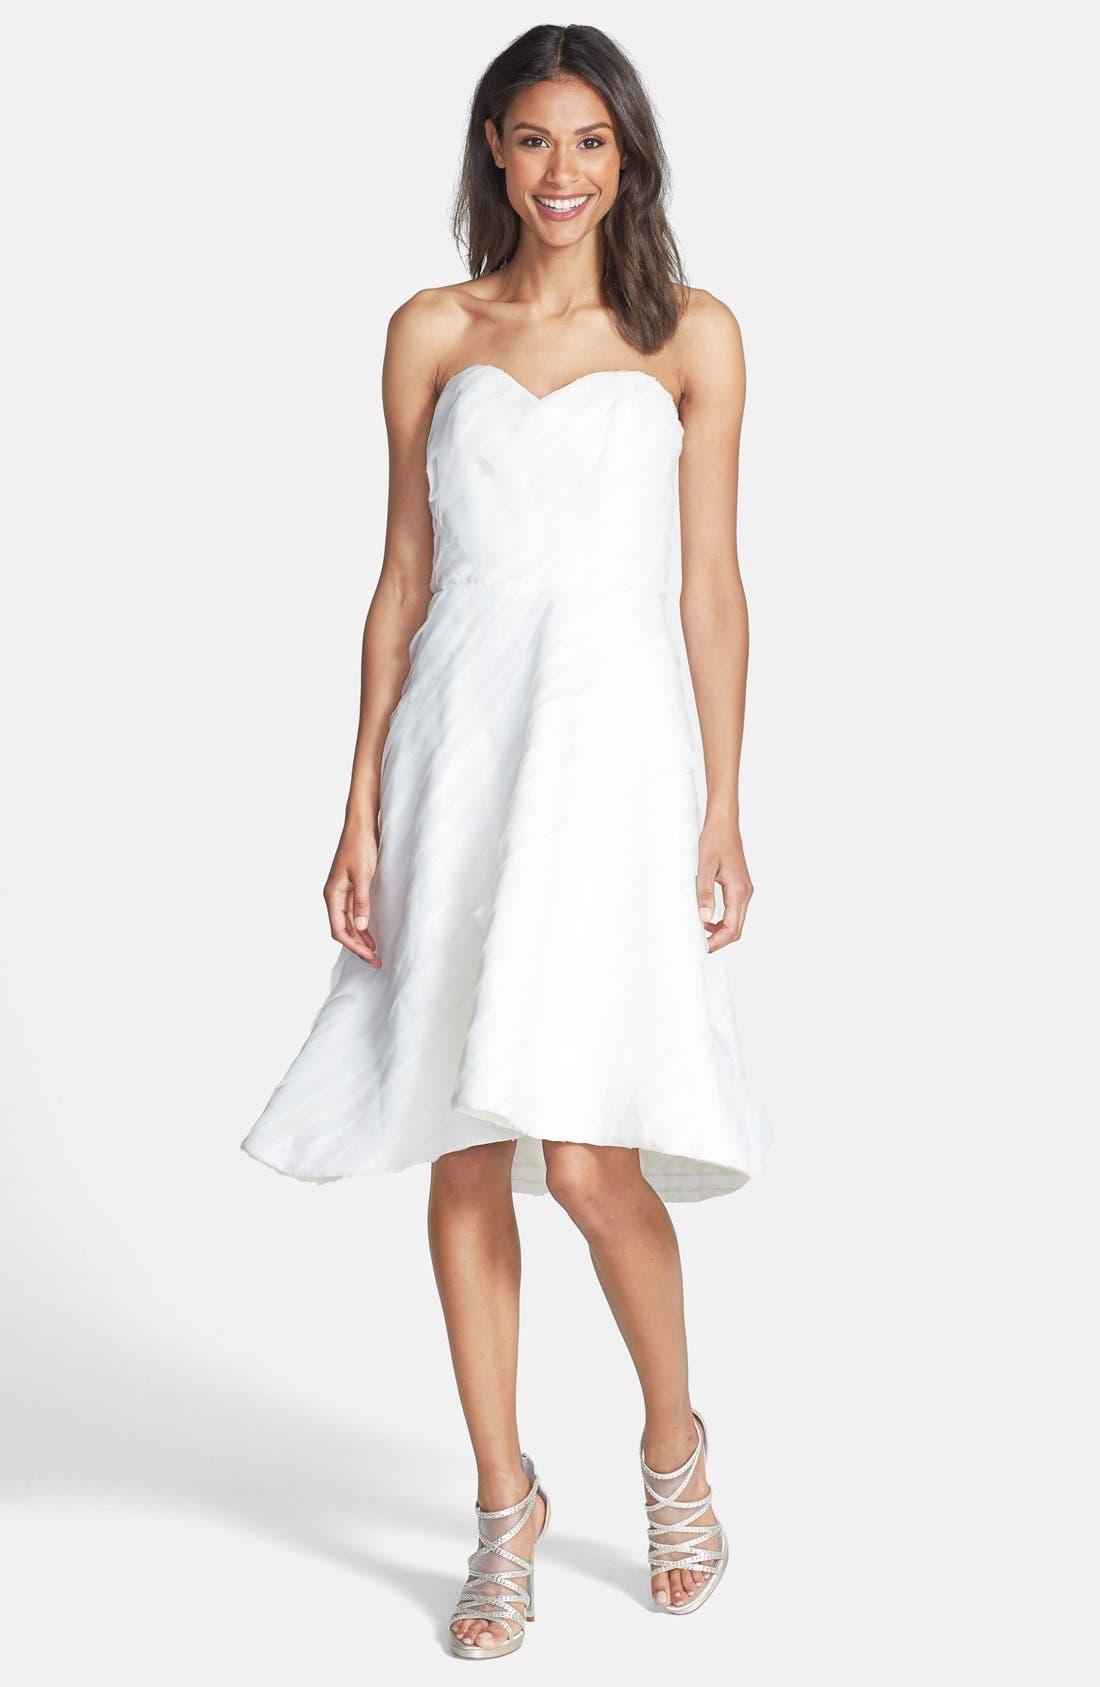 Main Image - Kirstie Kelly Strapless Laser Cut Organza Dress